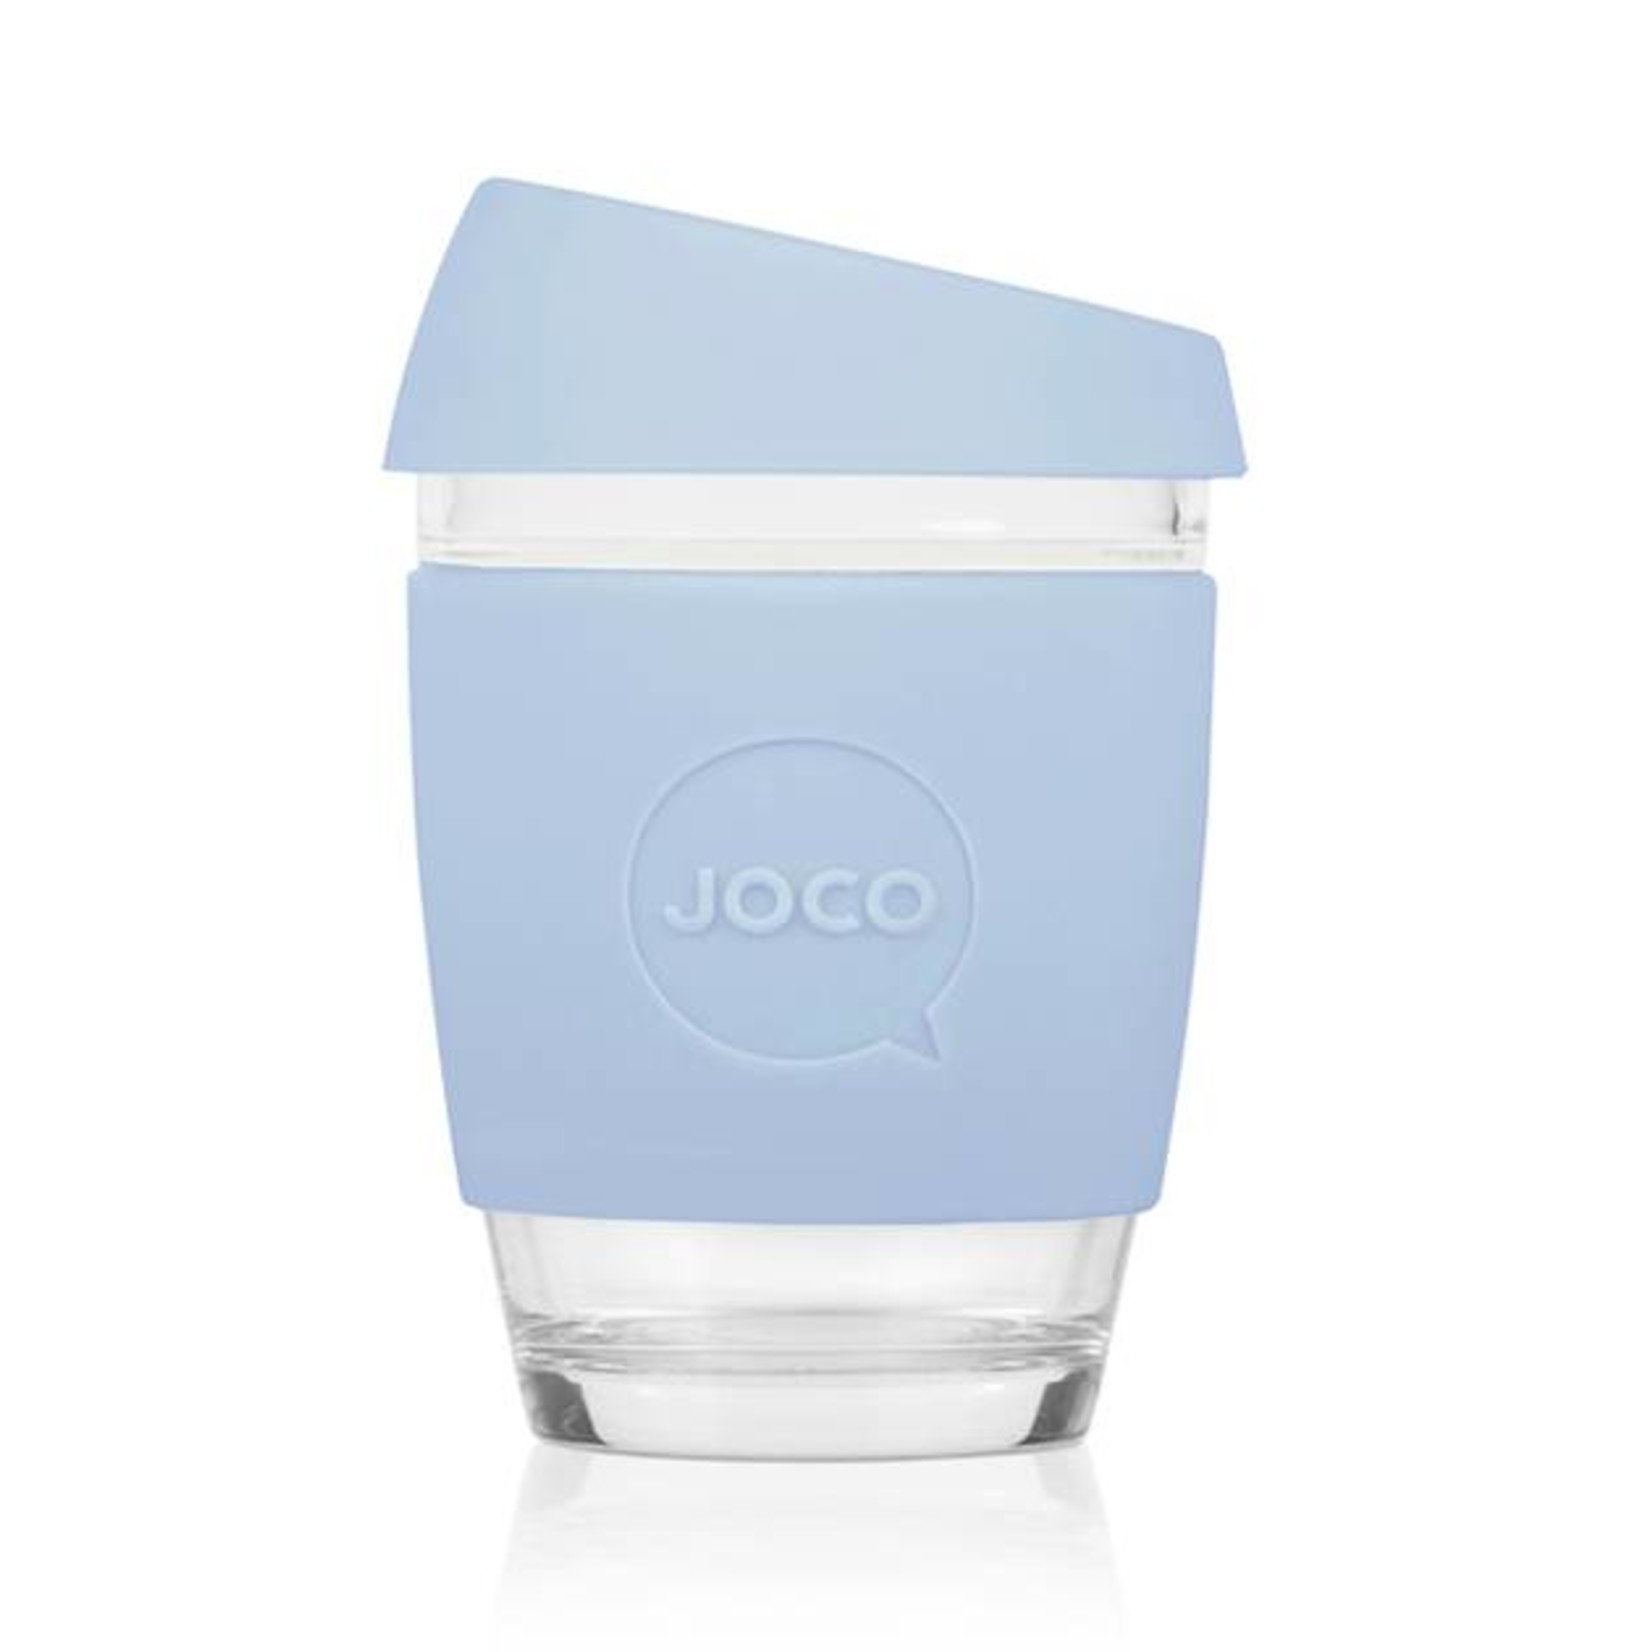 Joco JOCO herbruikbare koffiebeker - vintage kleuren